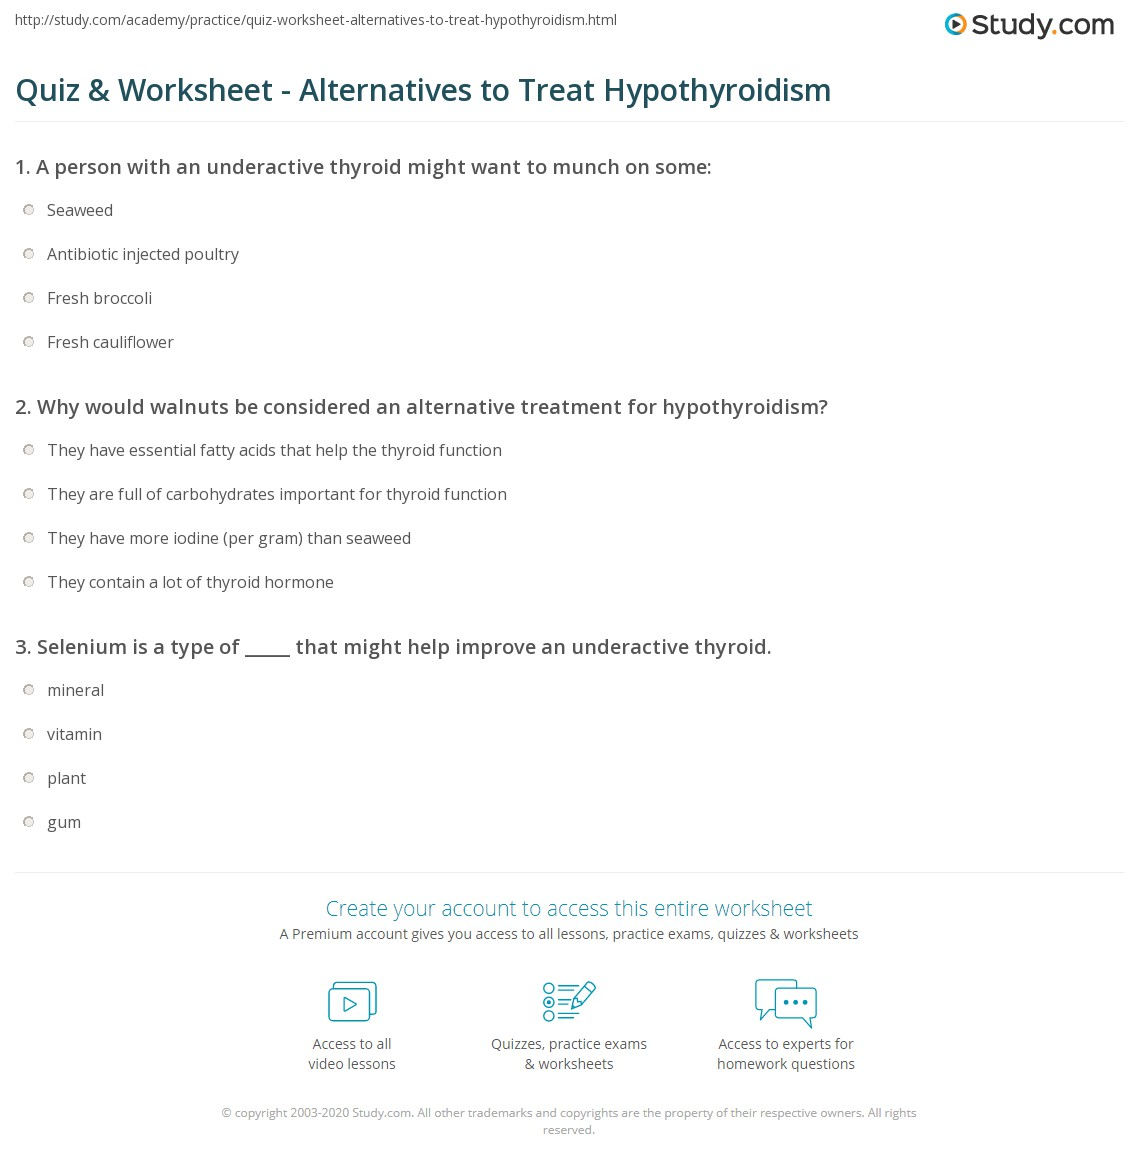 Quiz & Worksheet - Alternatives to Treat Hypothyroidism